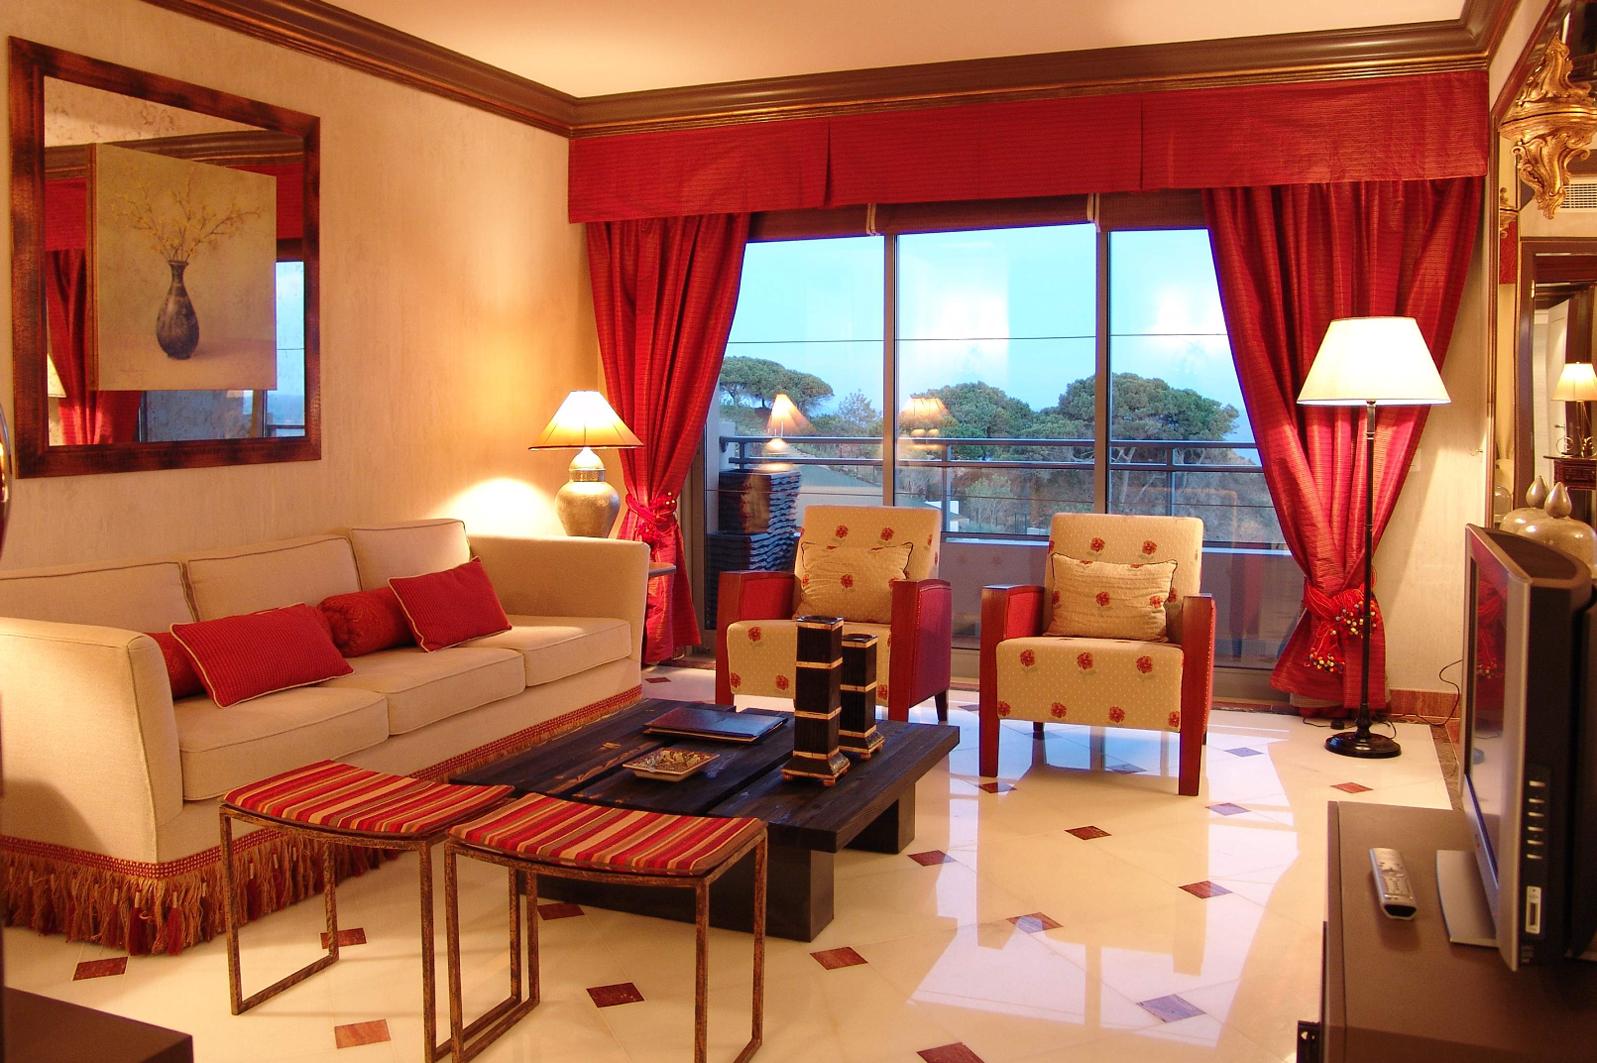 View In Gallery Idea Dekorasi Ruang Tamu Dengan Langsir Merah Dipadan Set Sofa Pastel